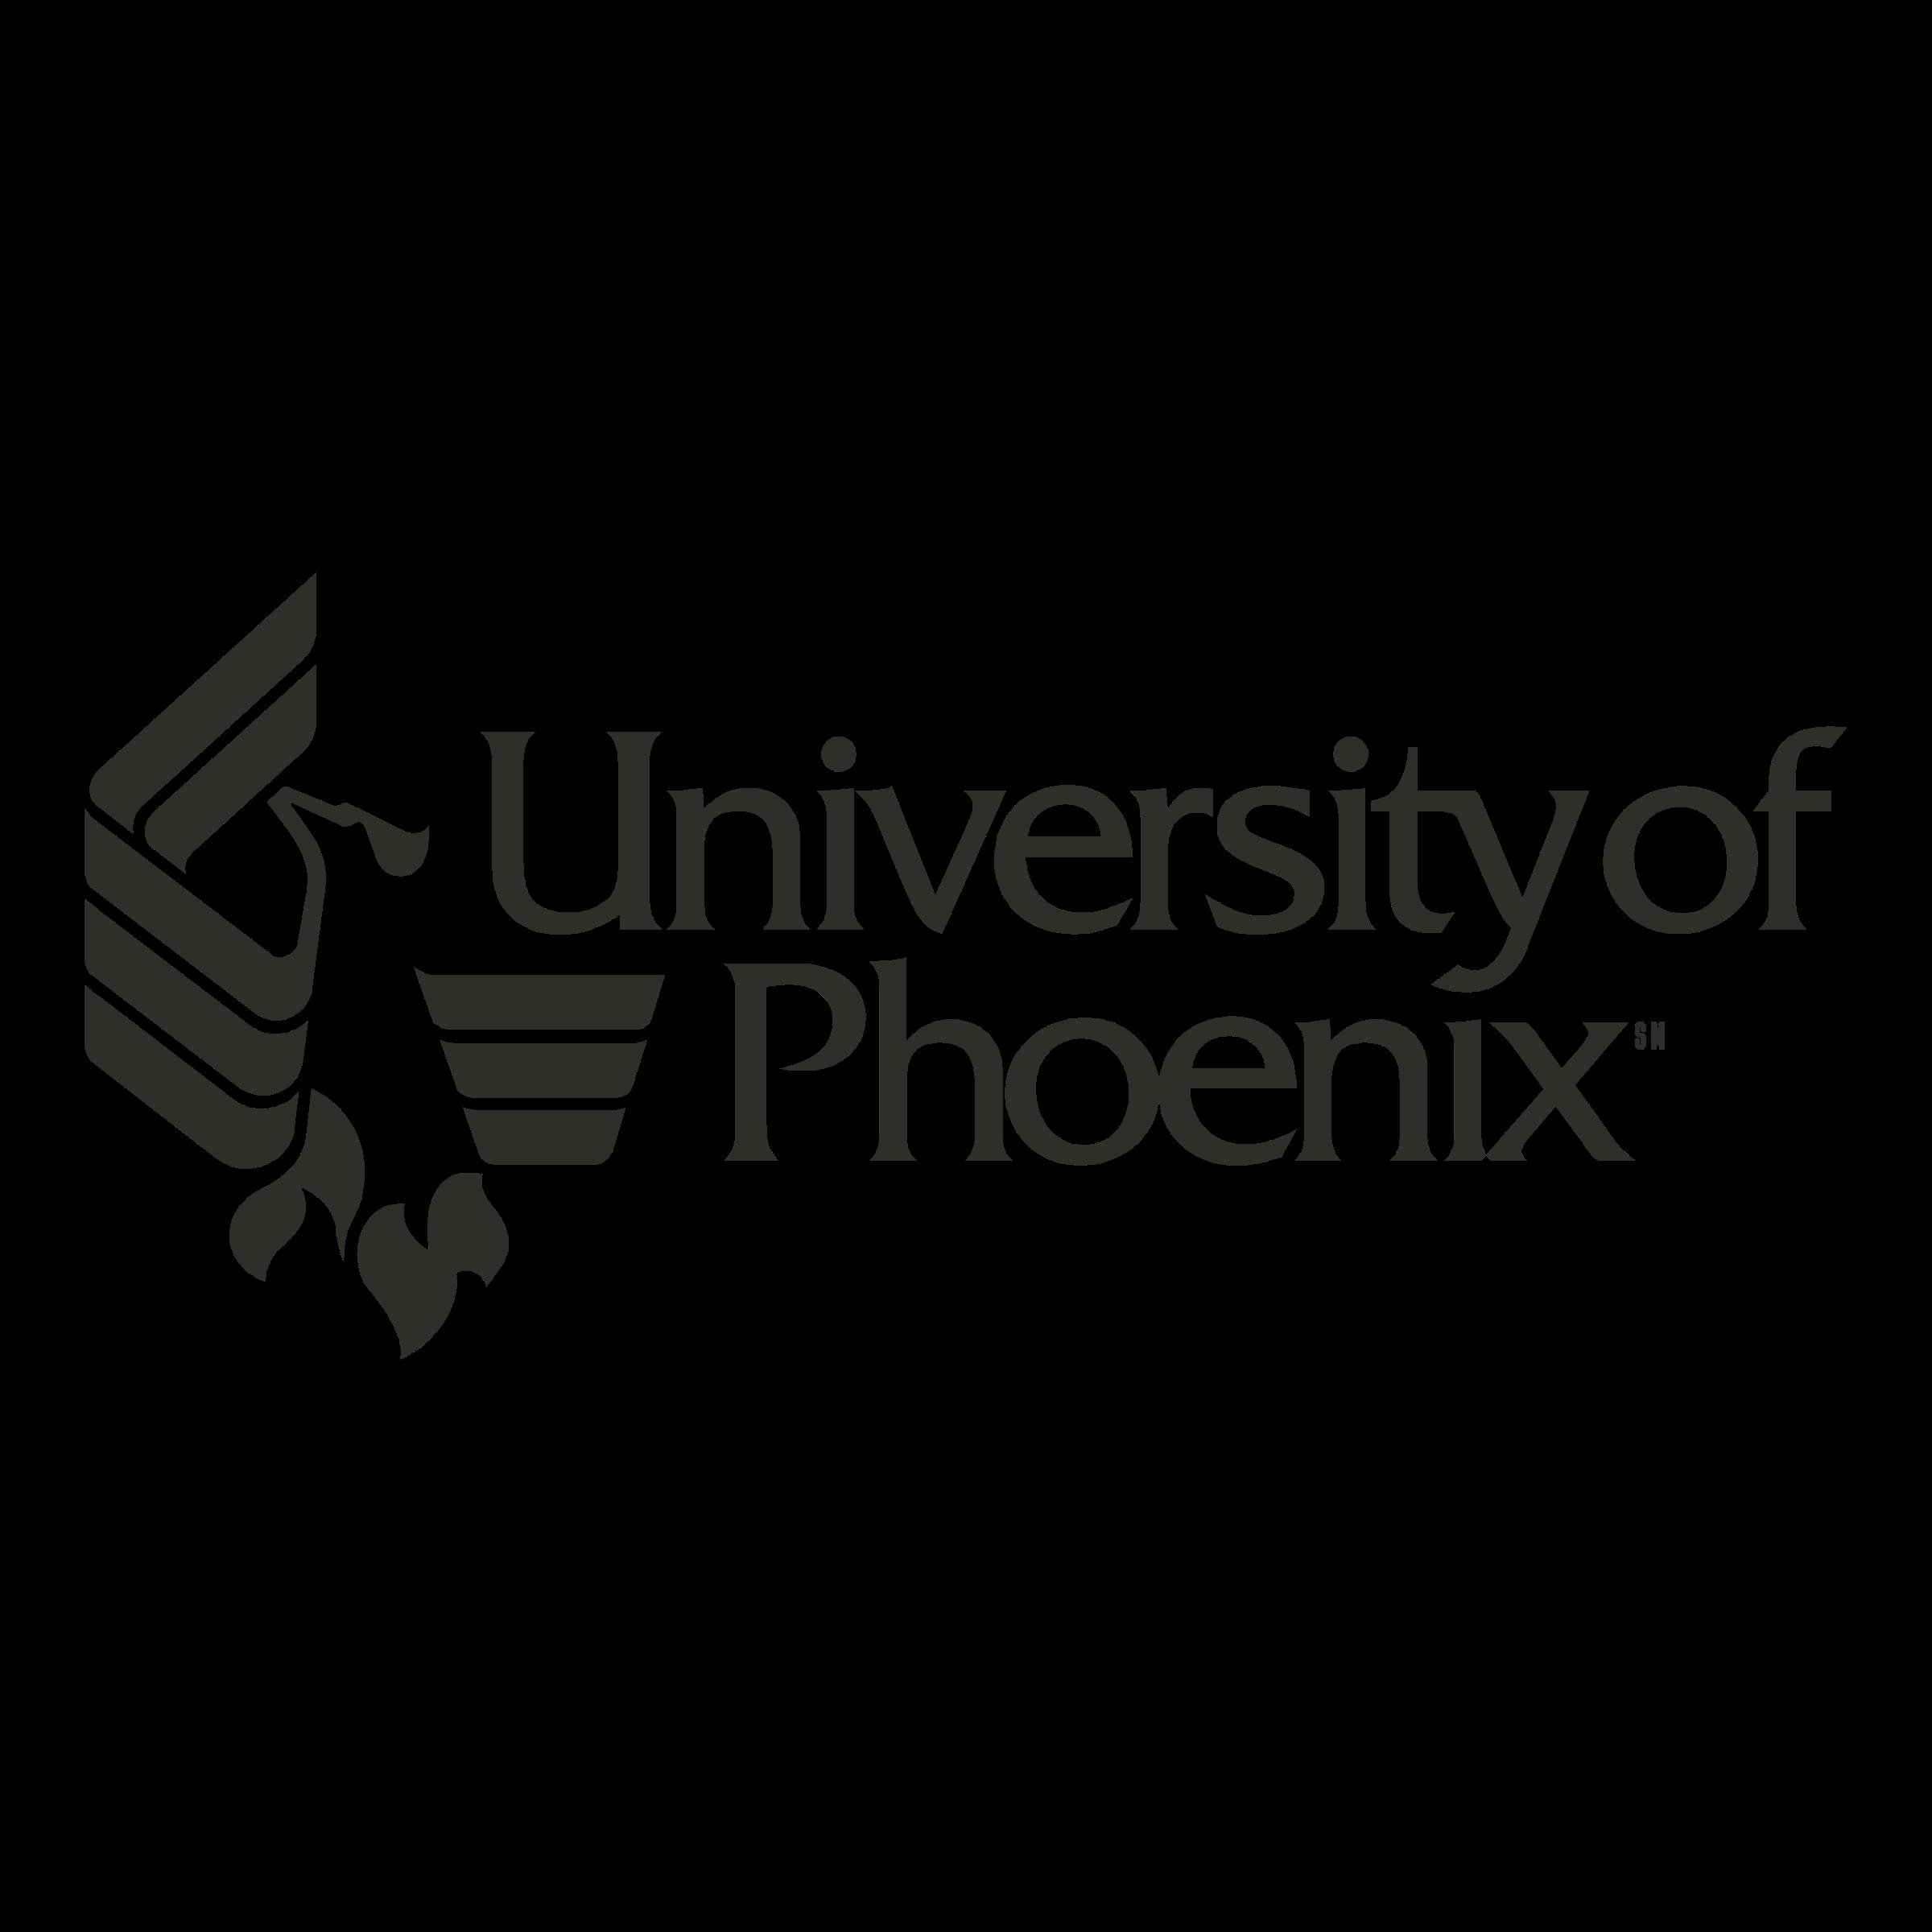 University Of Phoenix Logo PNG Transparent